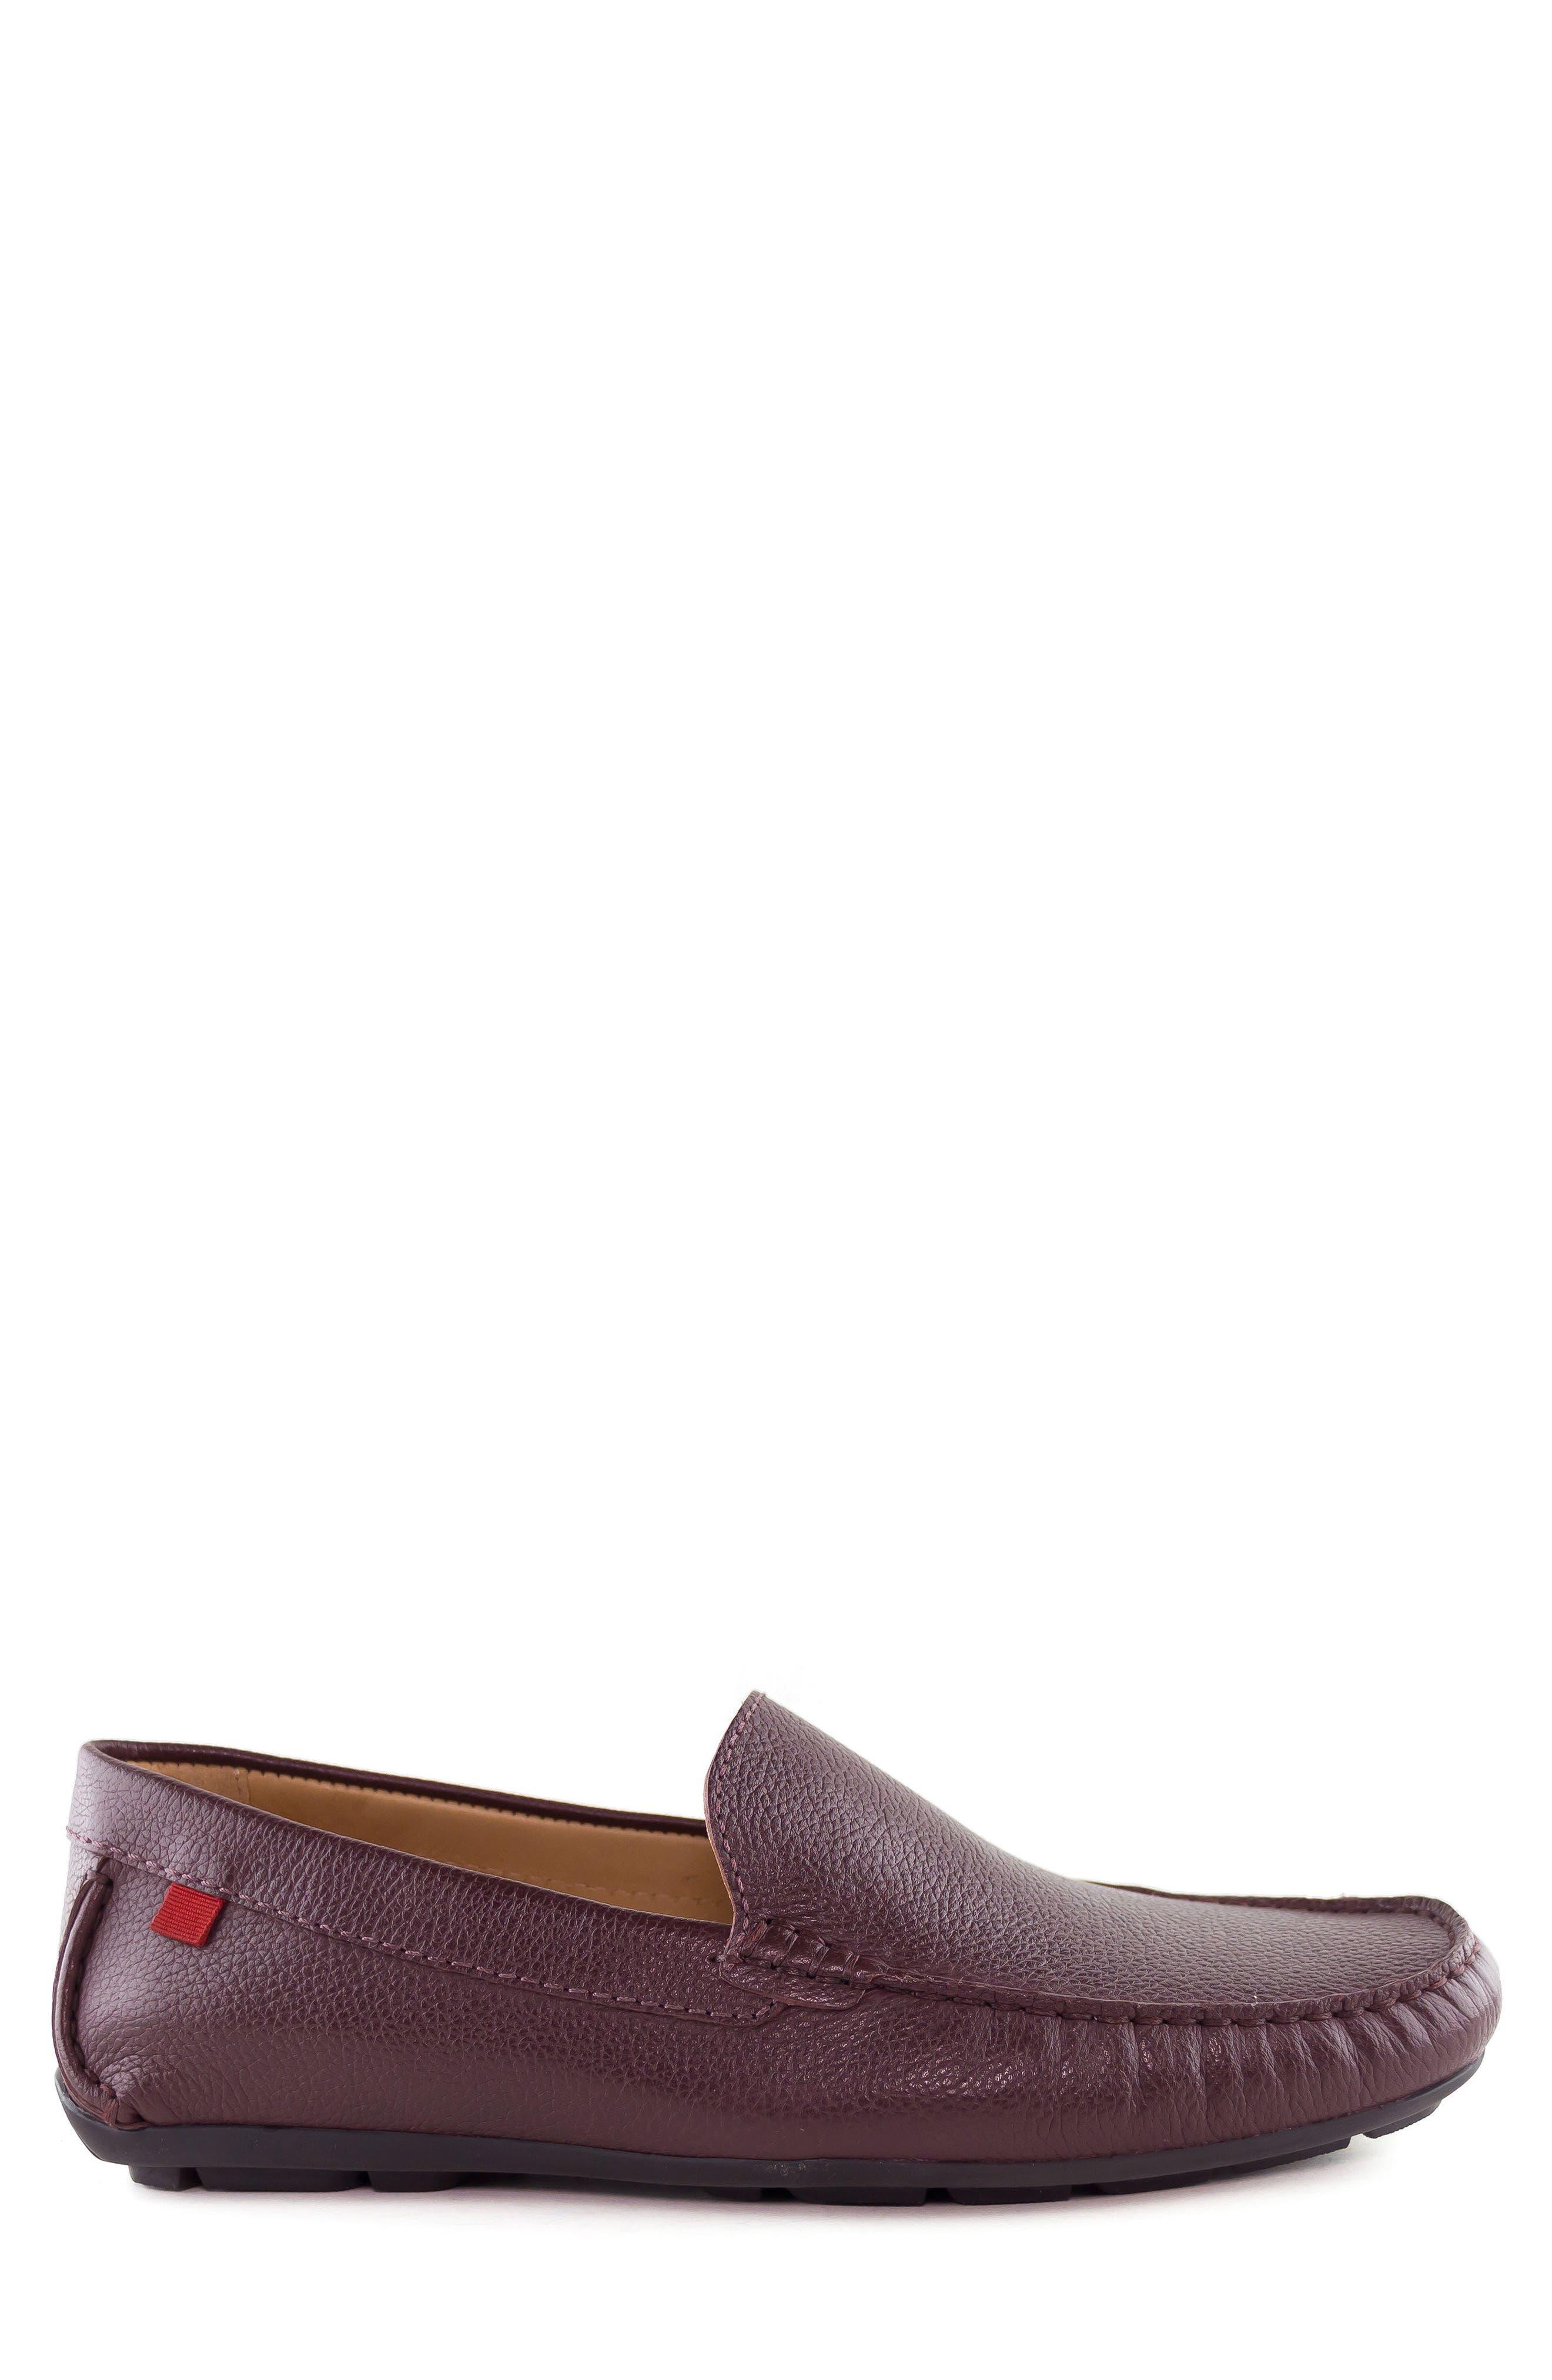 Venetian Driving Loafer,                             Alternate thumbnail 3, color,                             WINE GRAINY